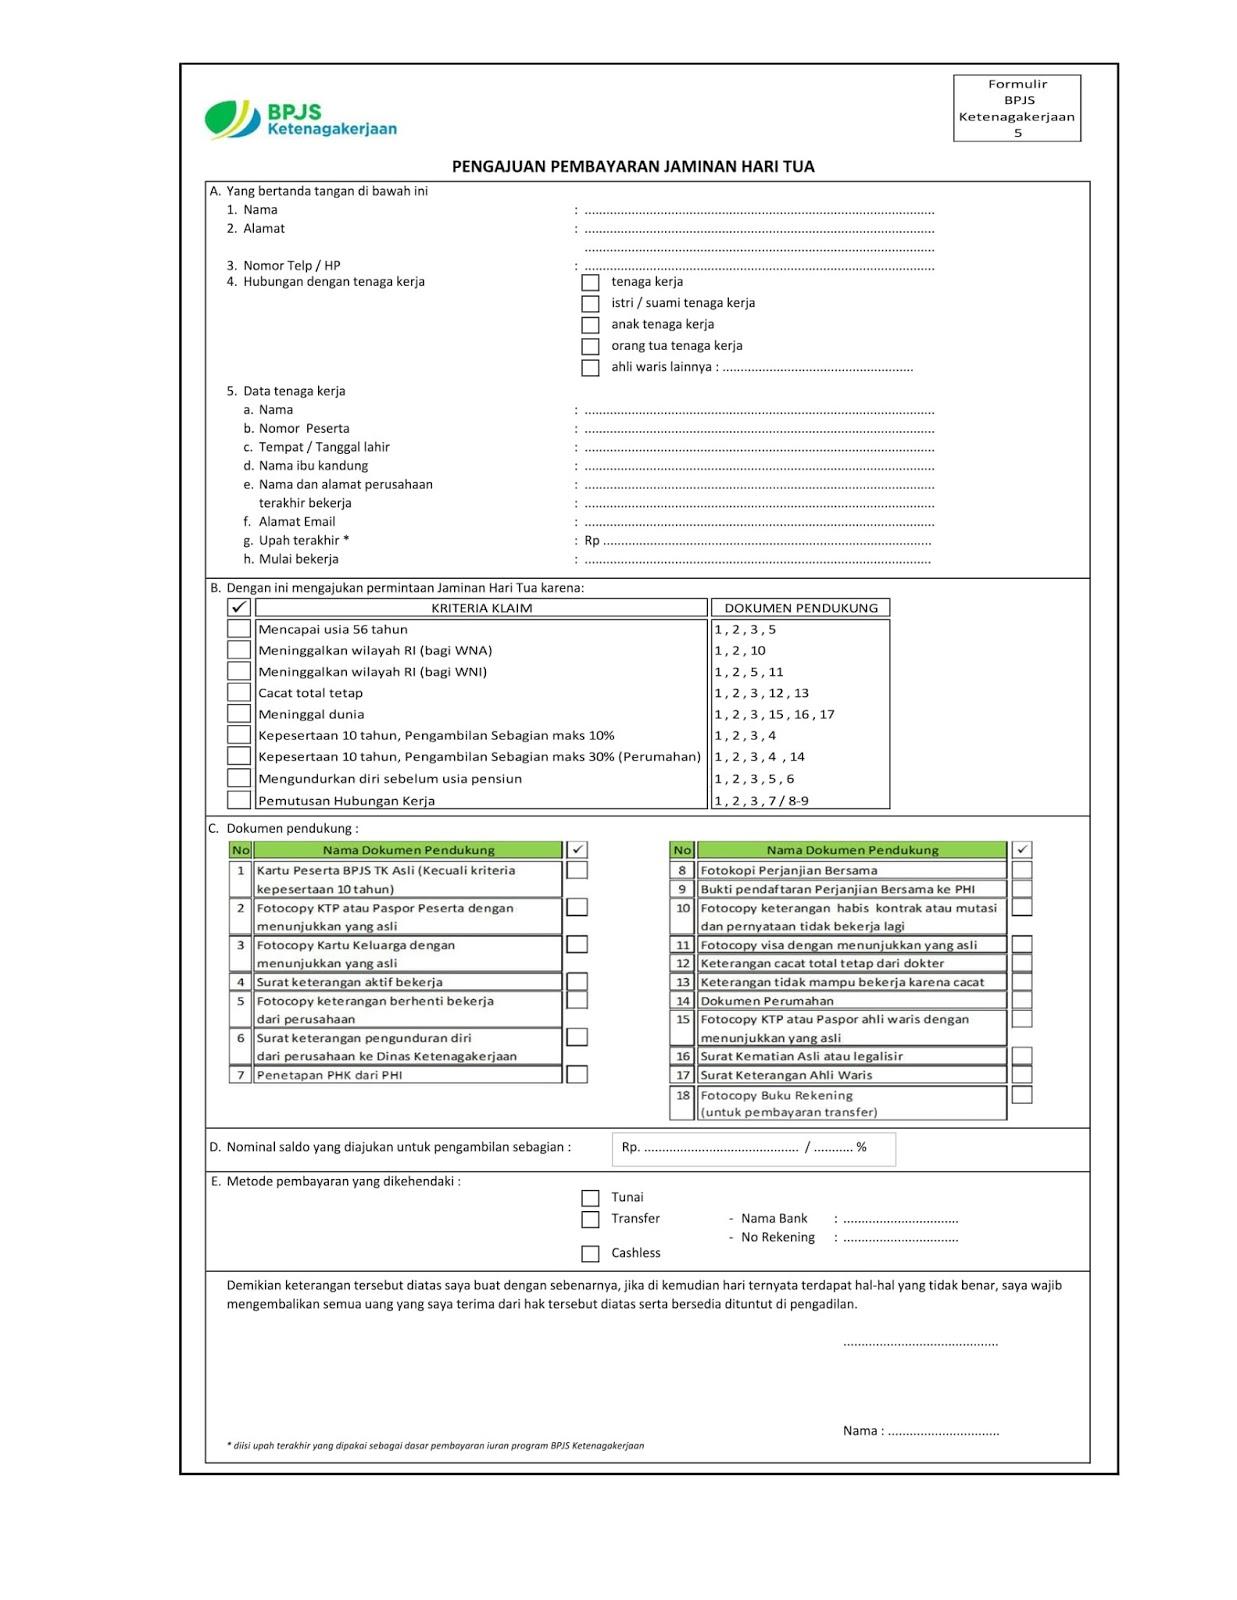 Form F5 Klaim BPJS Ketenagakerjaan